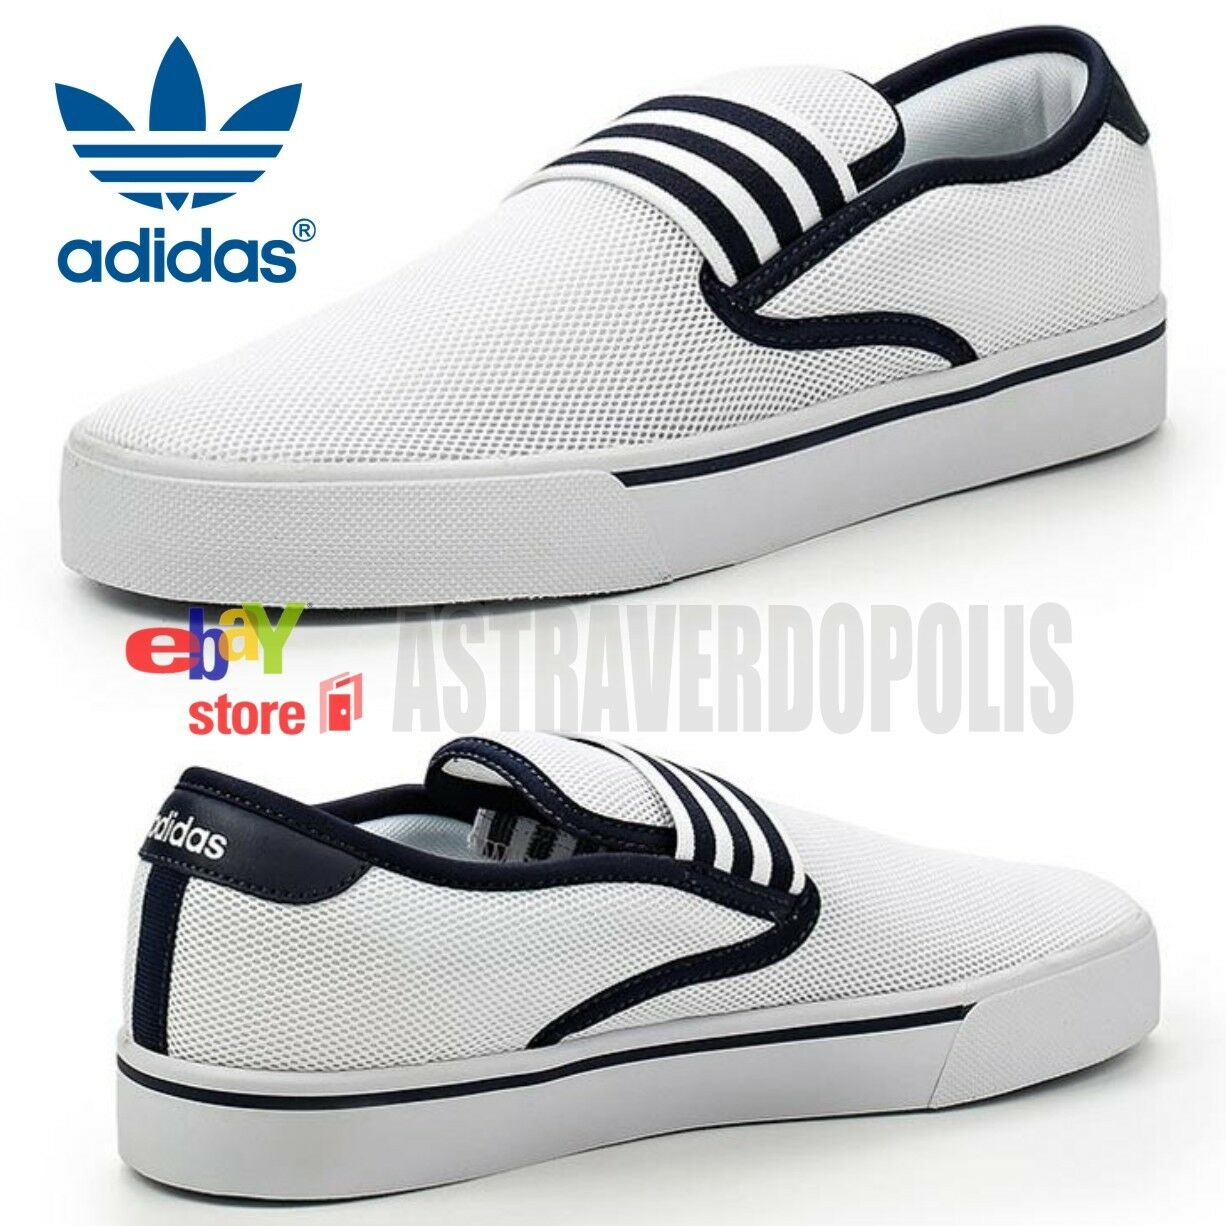 ADIDAS Para Hombre Zapatos Slipon Blanco Mar Sandalias NEO PARK Blanco Slipon ede6f2